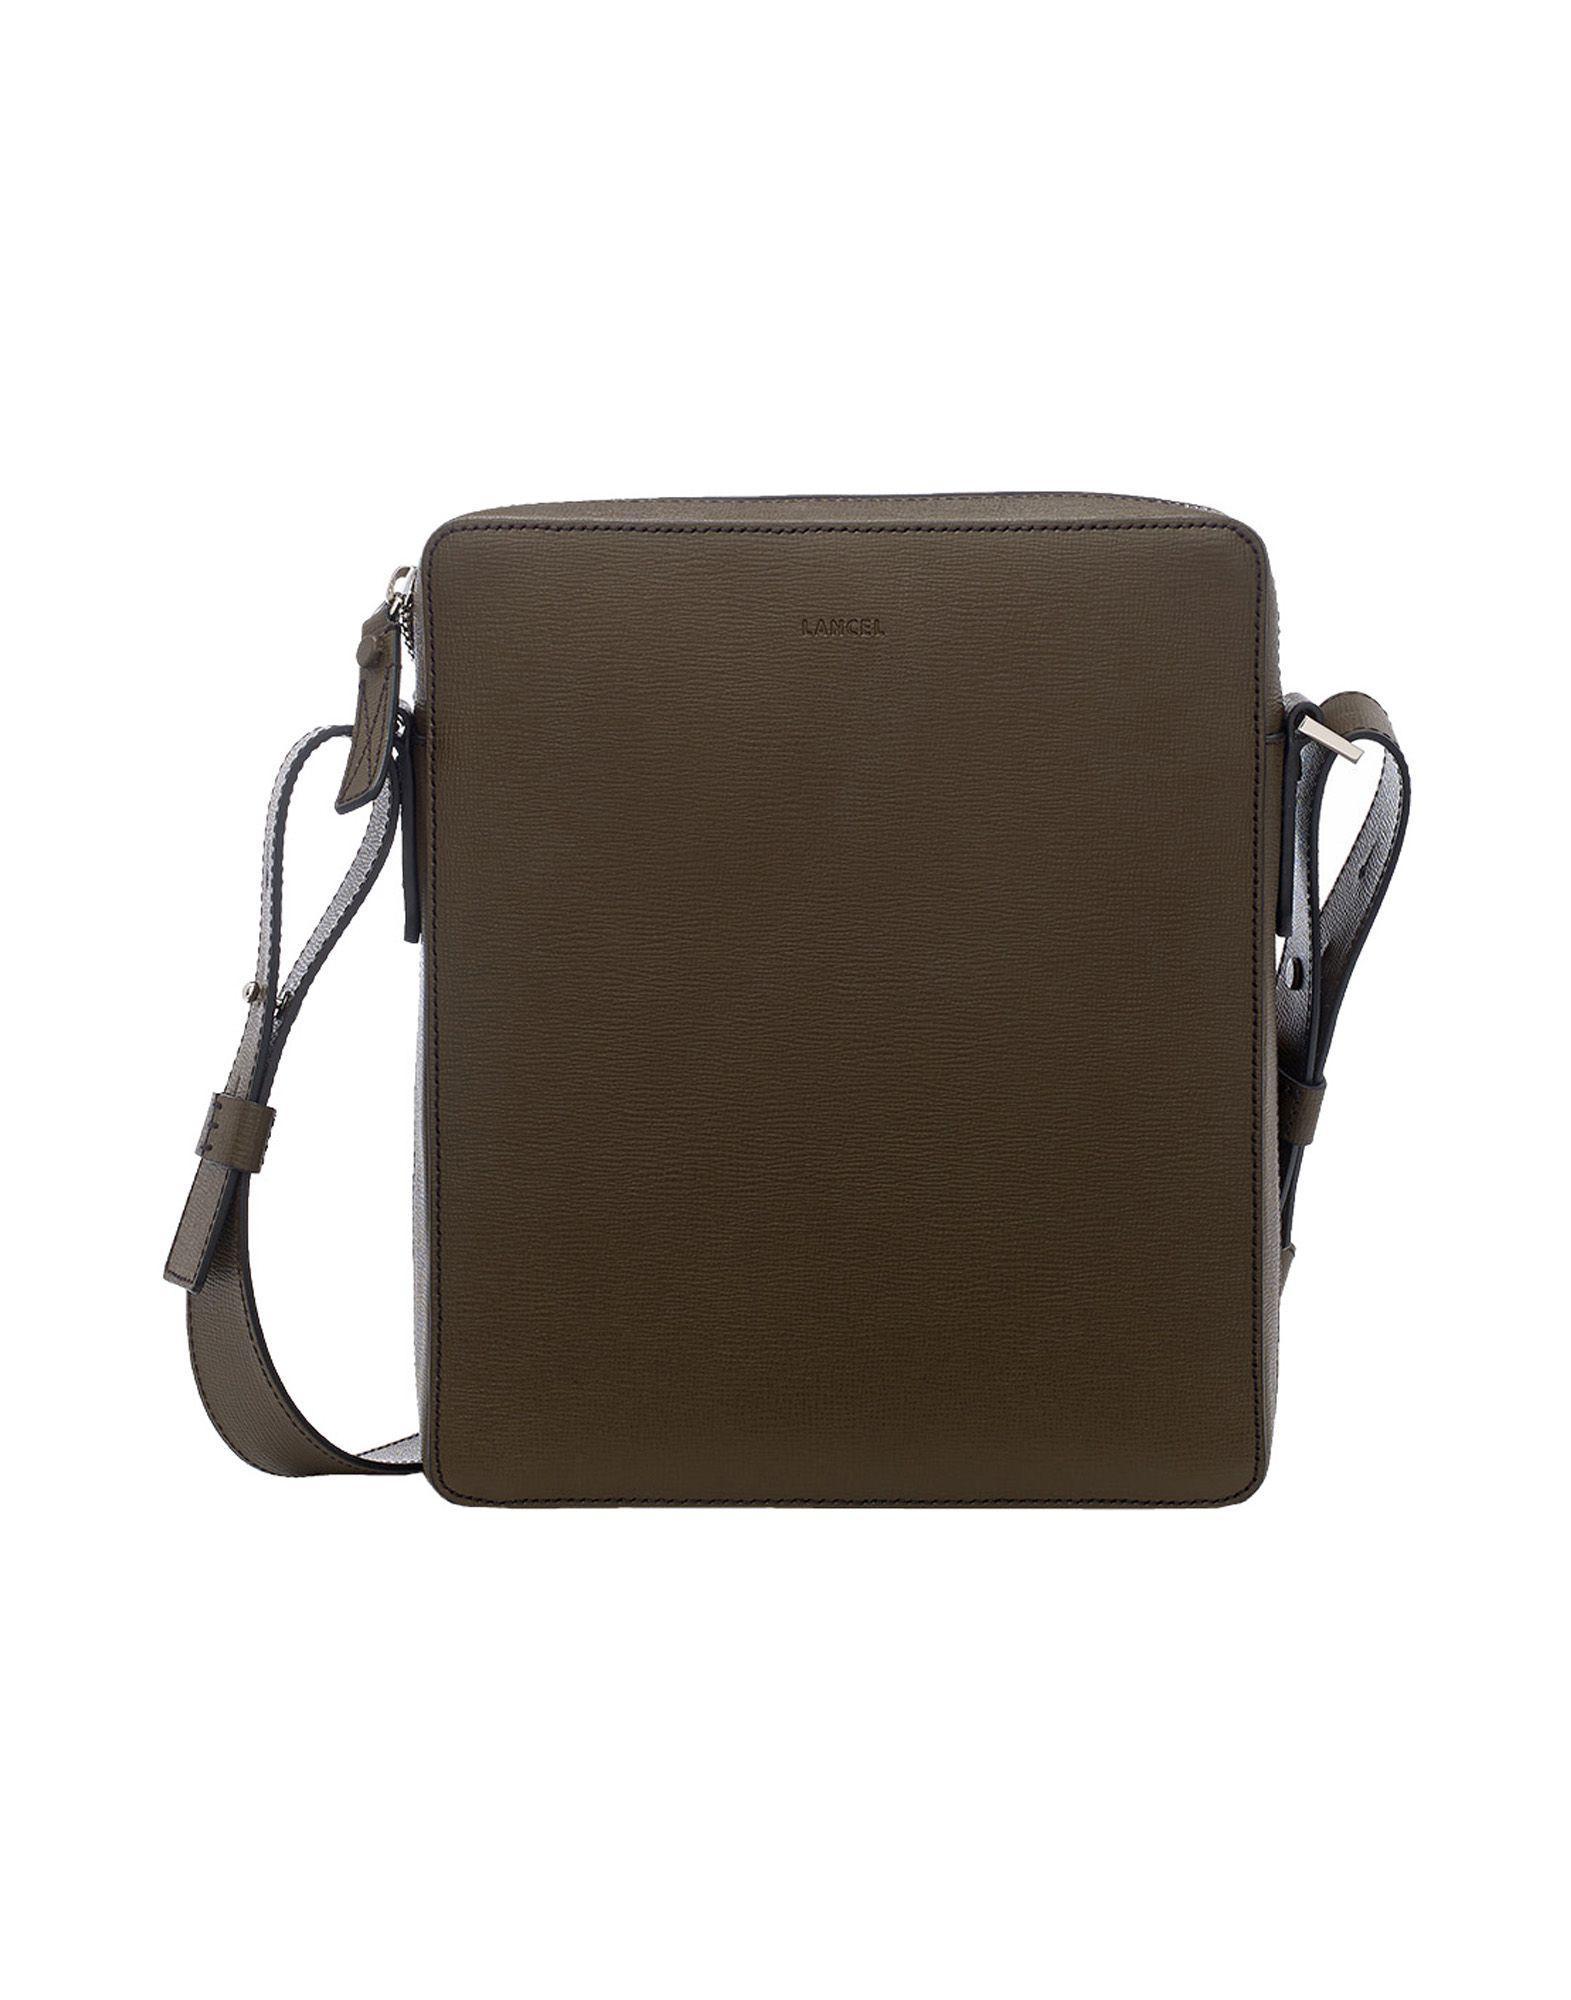 BAGS - Cross-body bags Lancel usYjSDq2Y